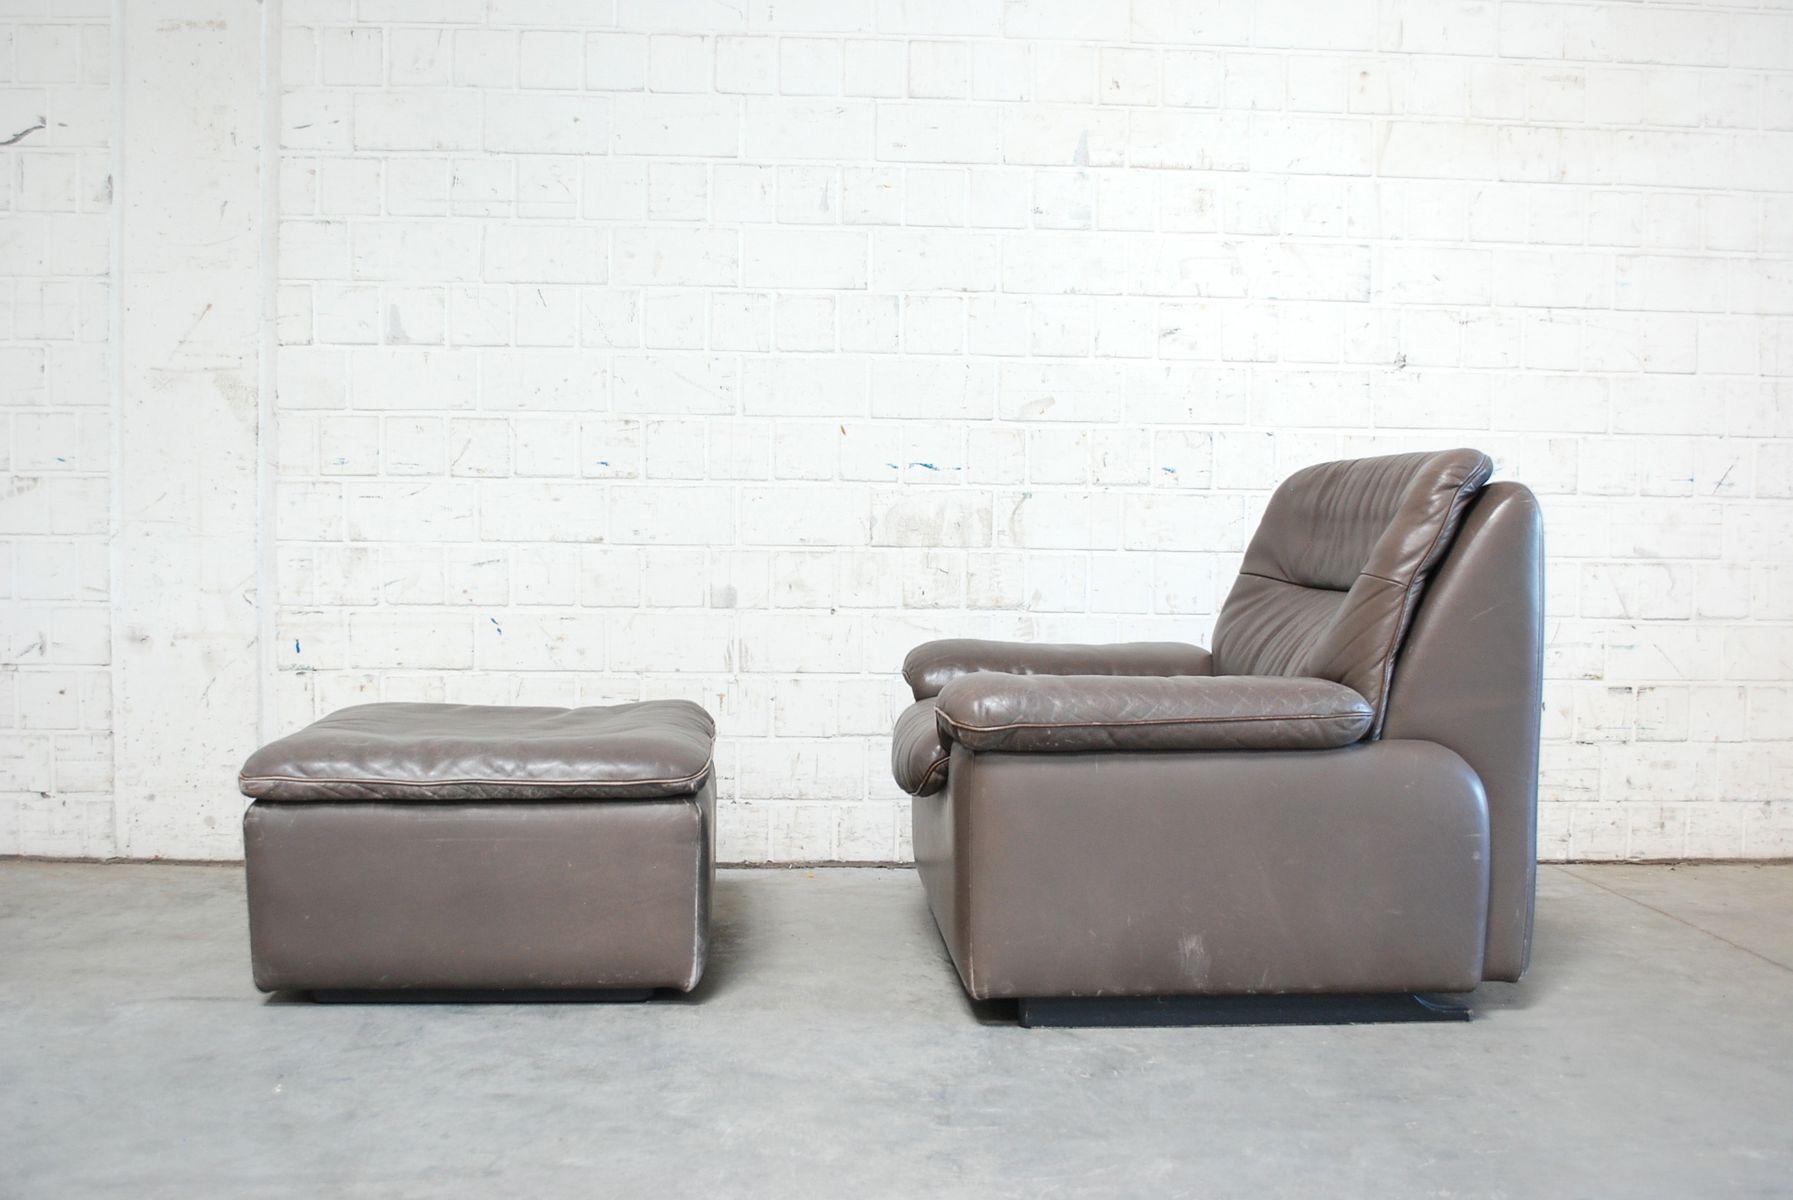 Swiss Grey Leather Lounge Chair U0026 Ottoman From De Sede, 1980s